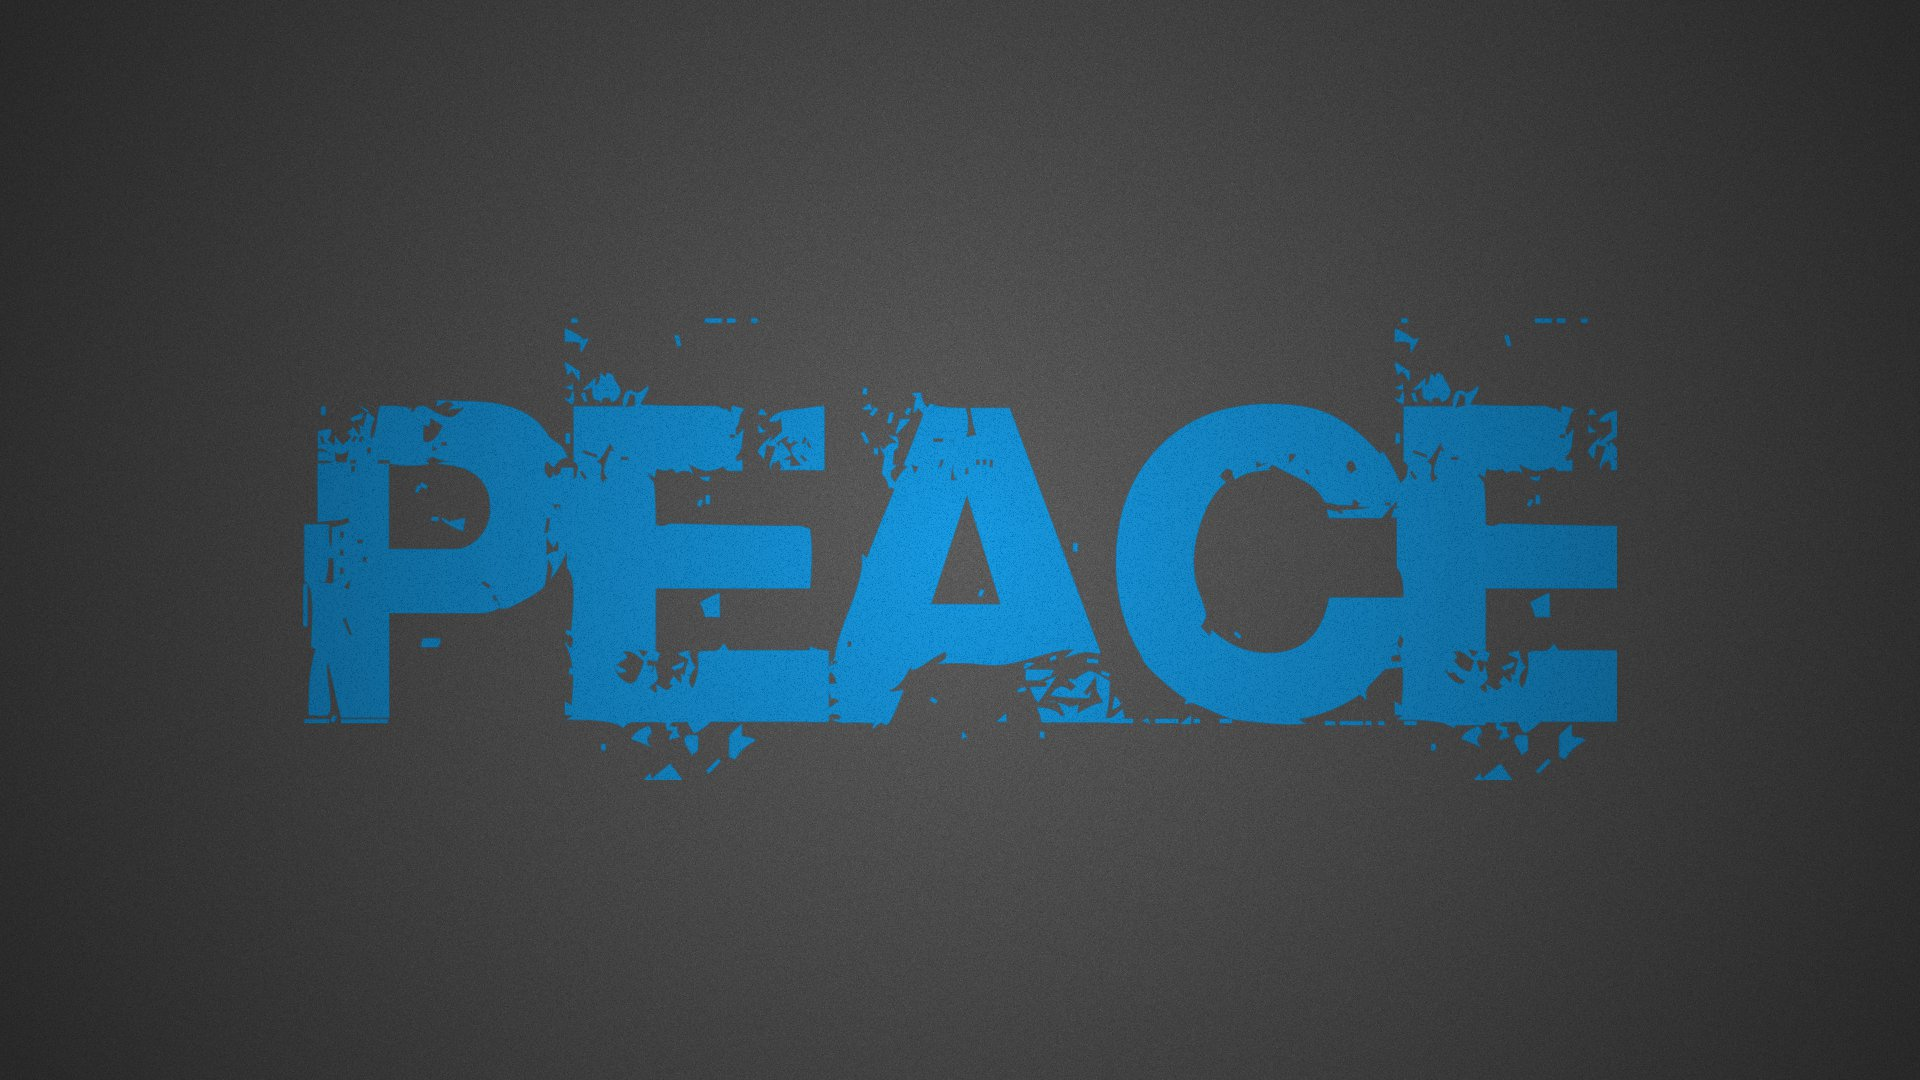 tumblr backgrounds peace 2 - photo #12